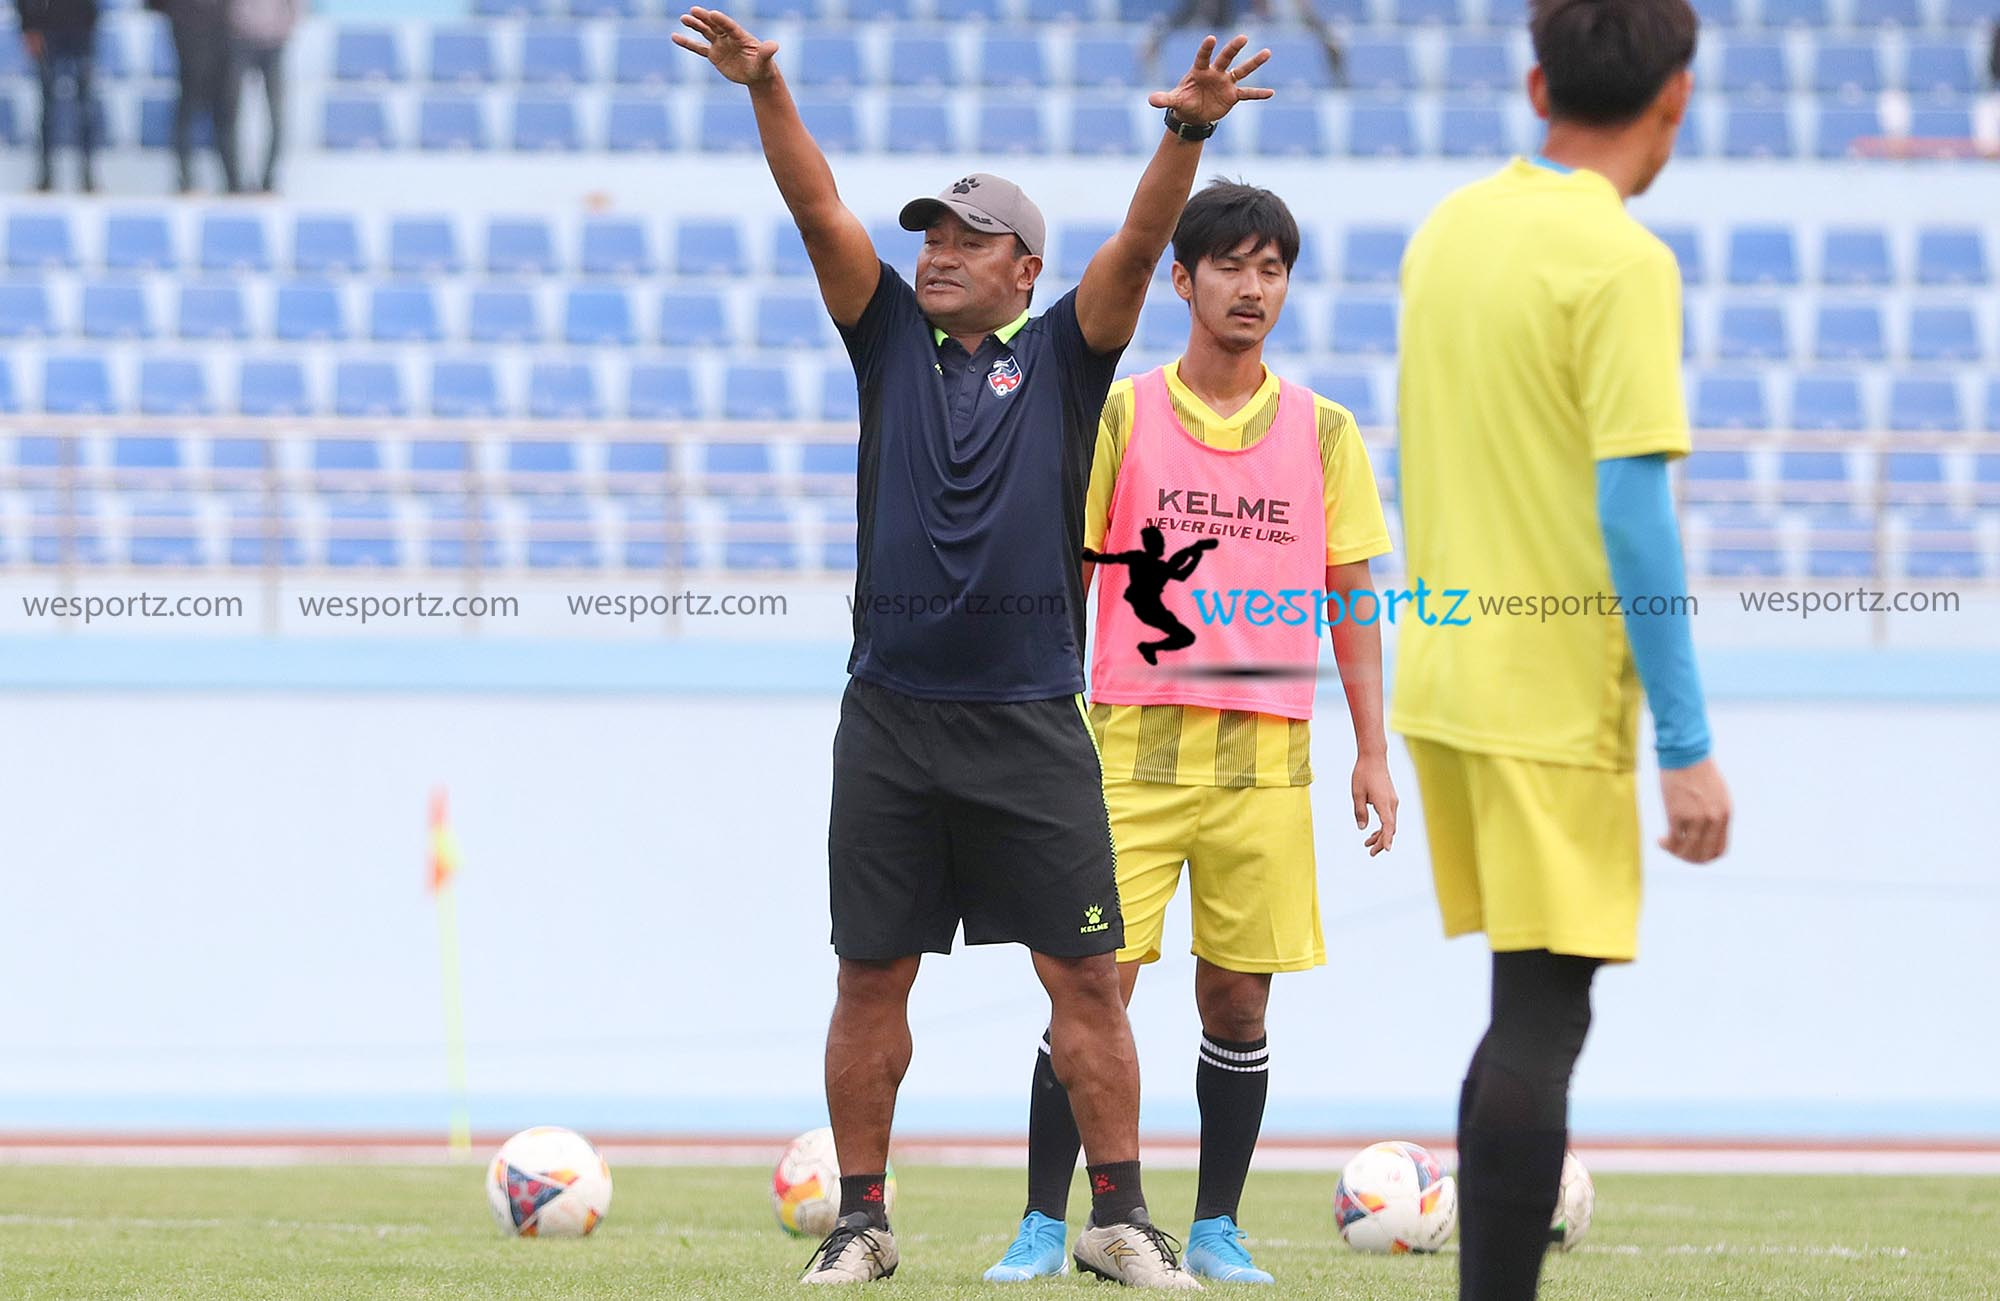 balgopal maharaja coach, balgopal maharaja during training,